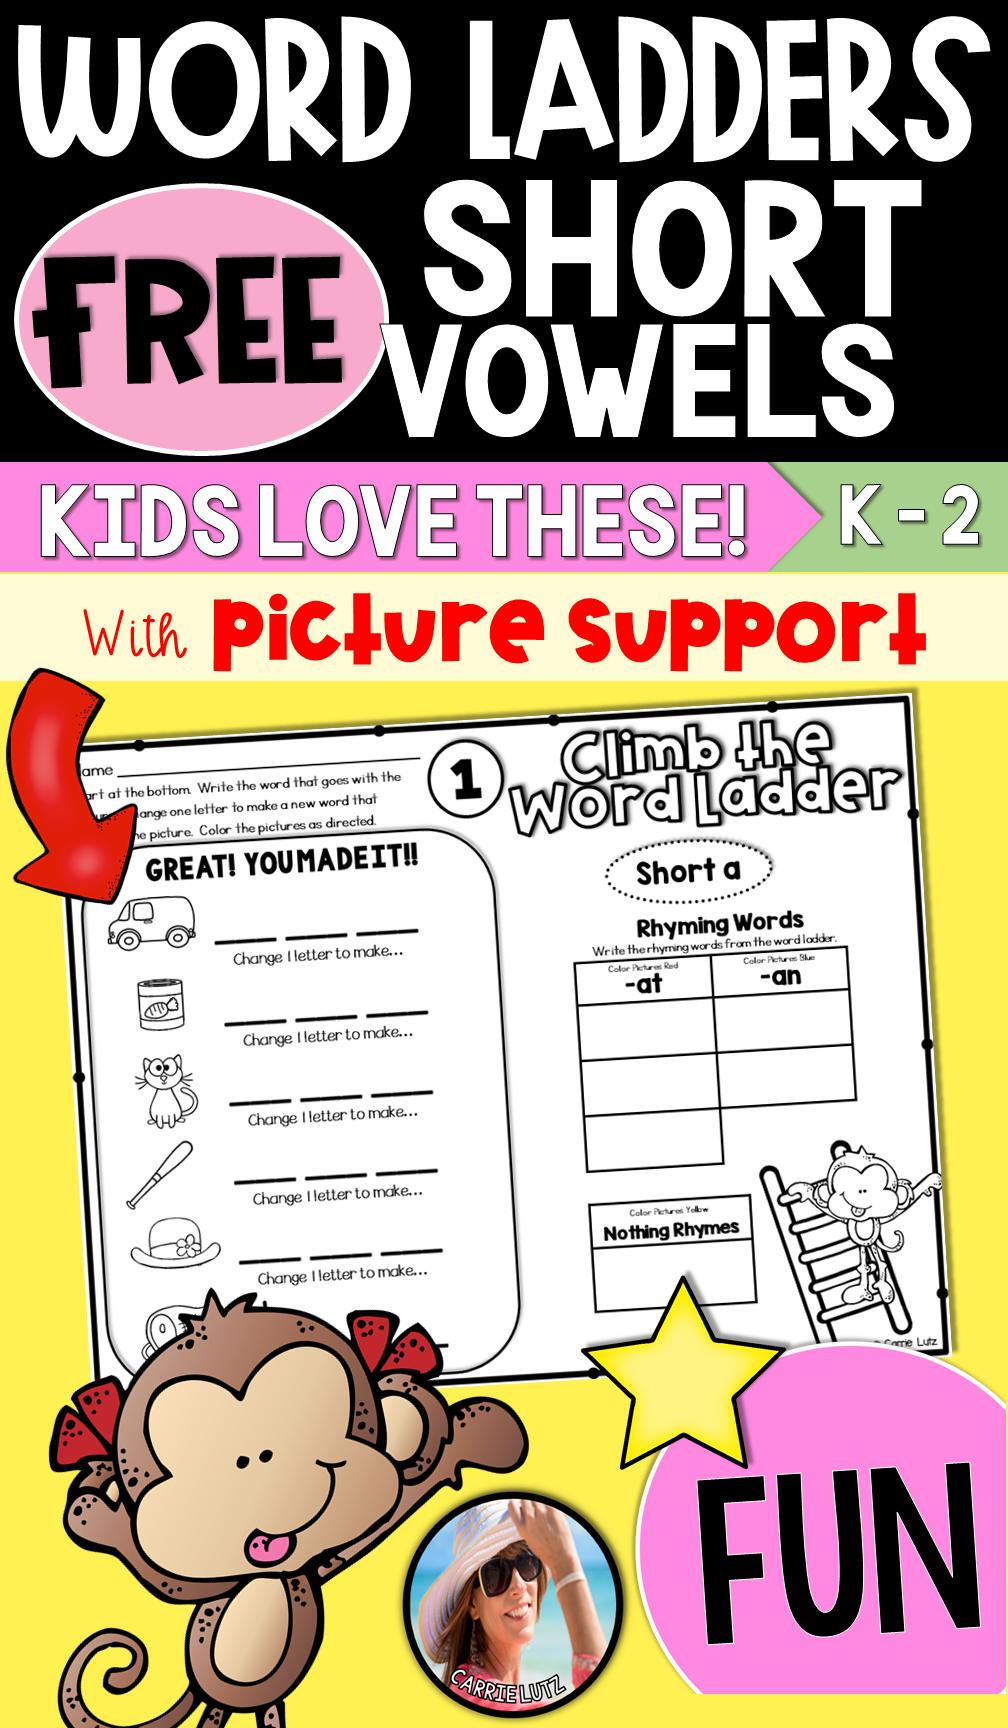 Word Ladders - Short Vowels - Freebie | TpT FREE LESSONS | Pinterest